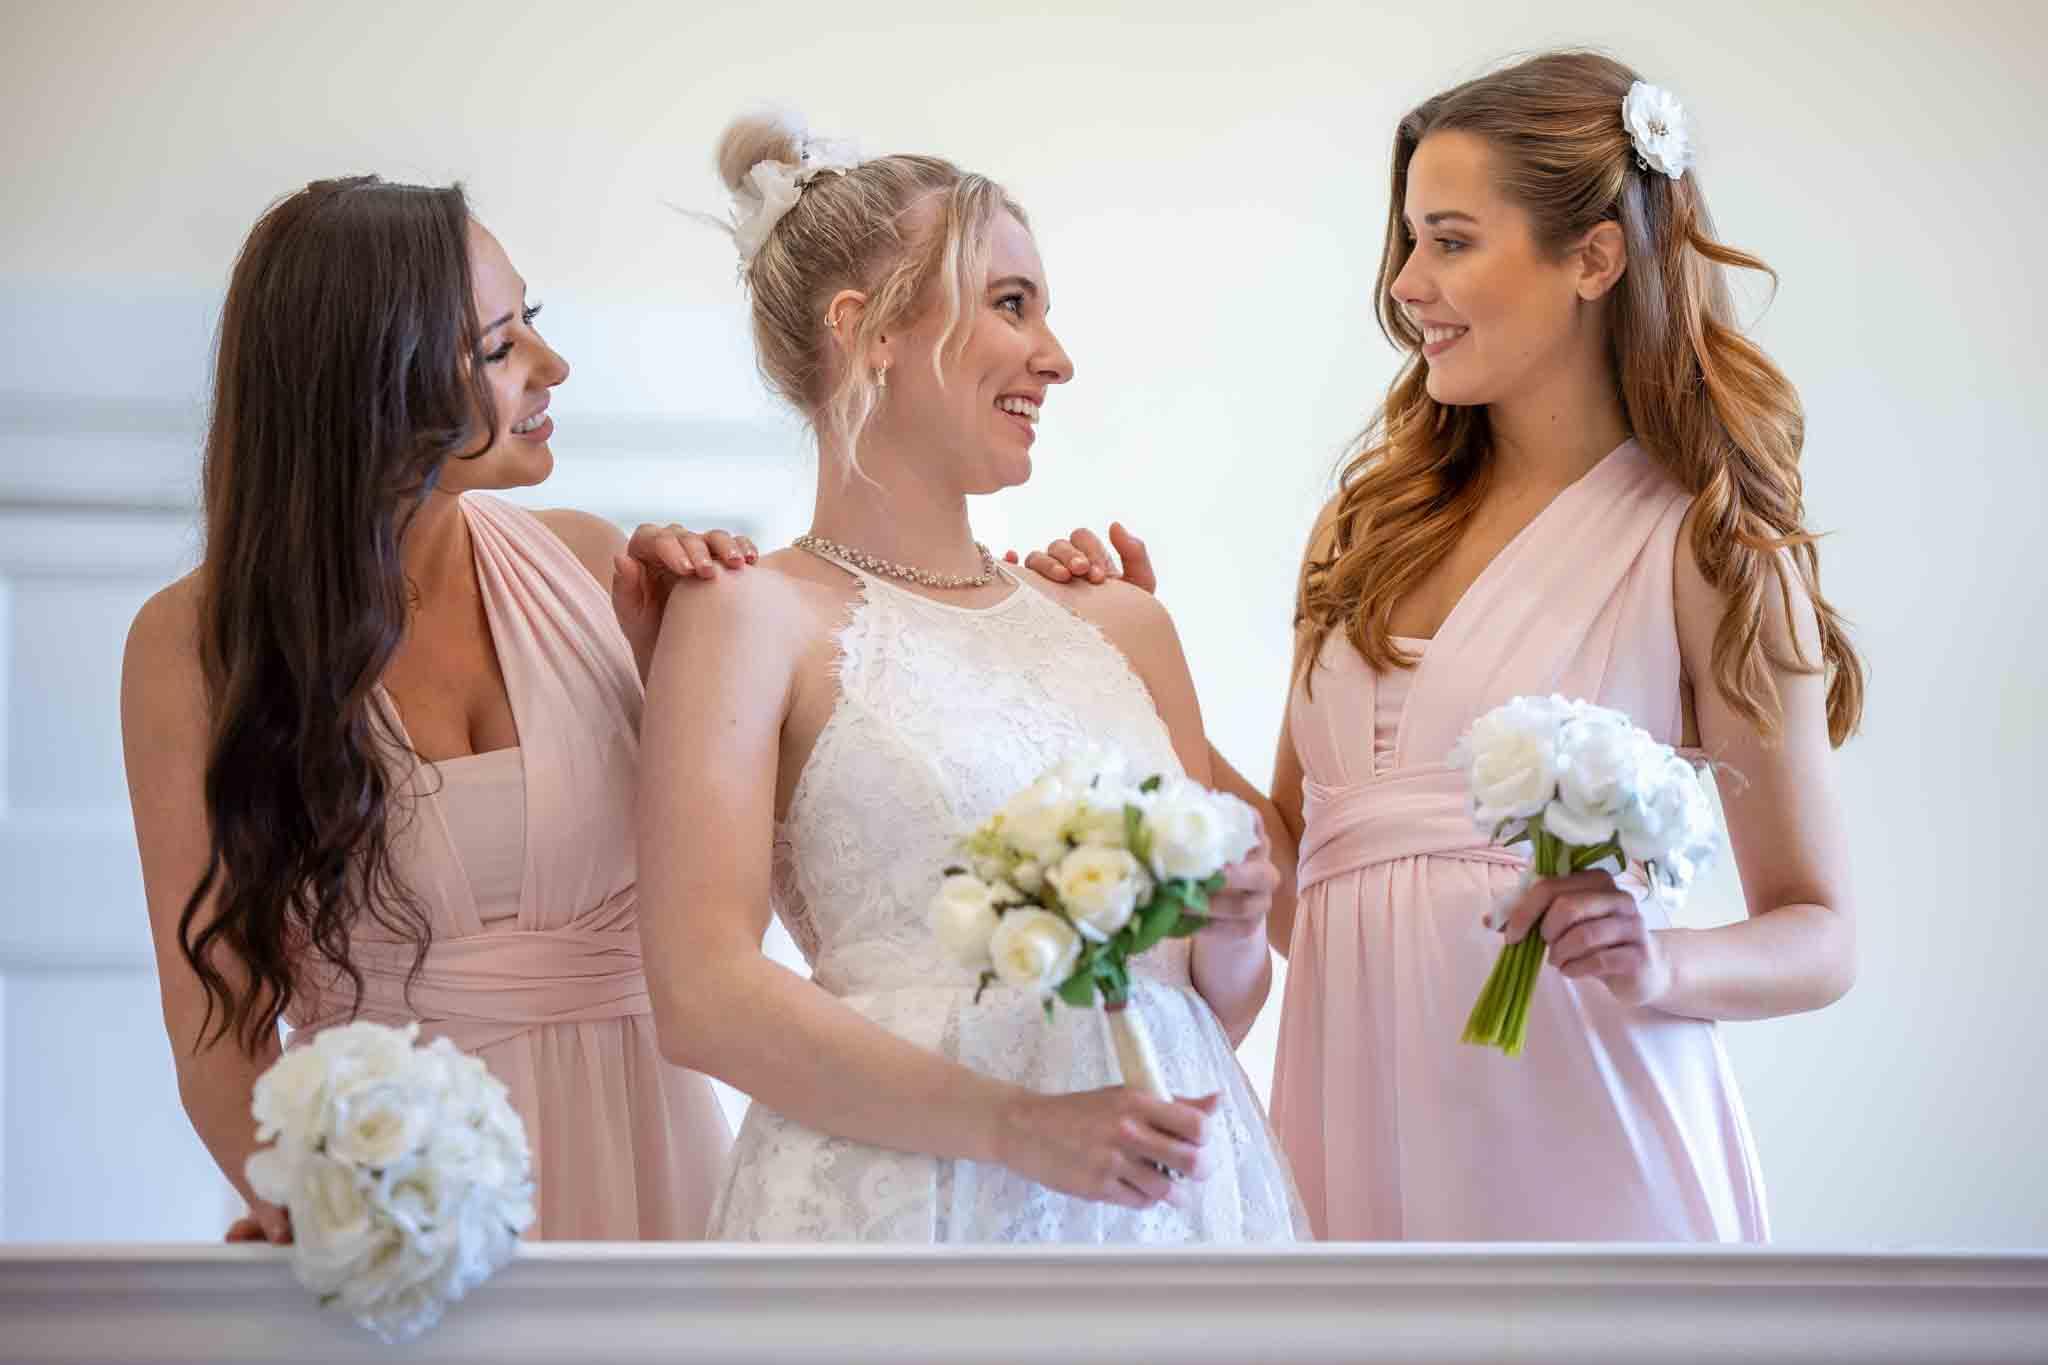 Wedding-Preparation-Photographer-North-East